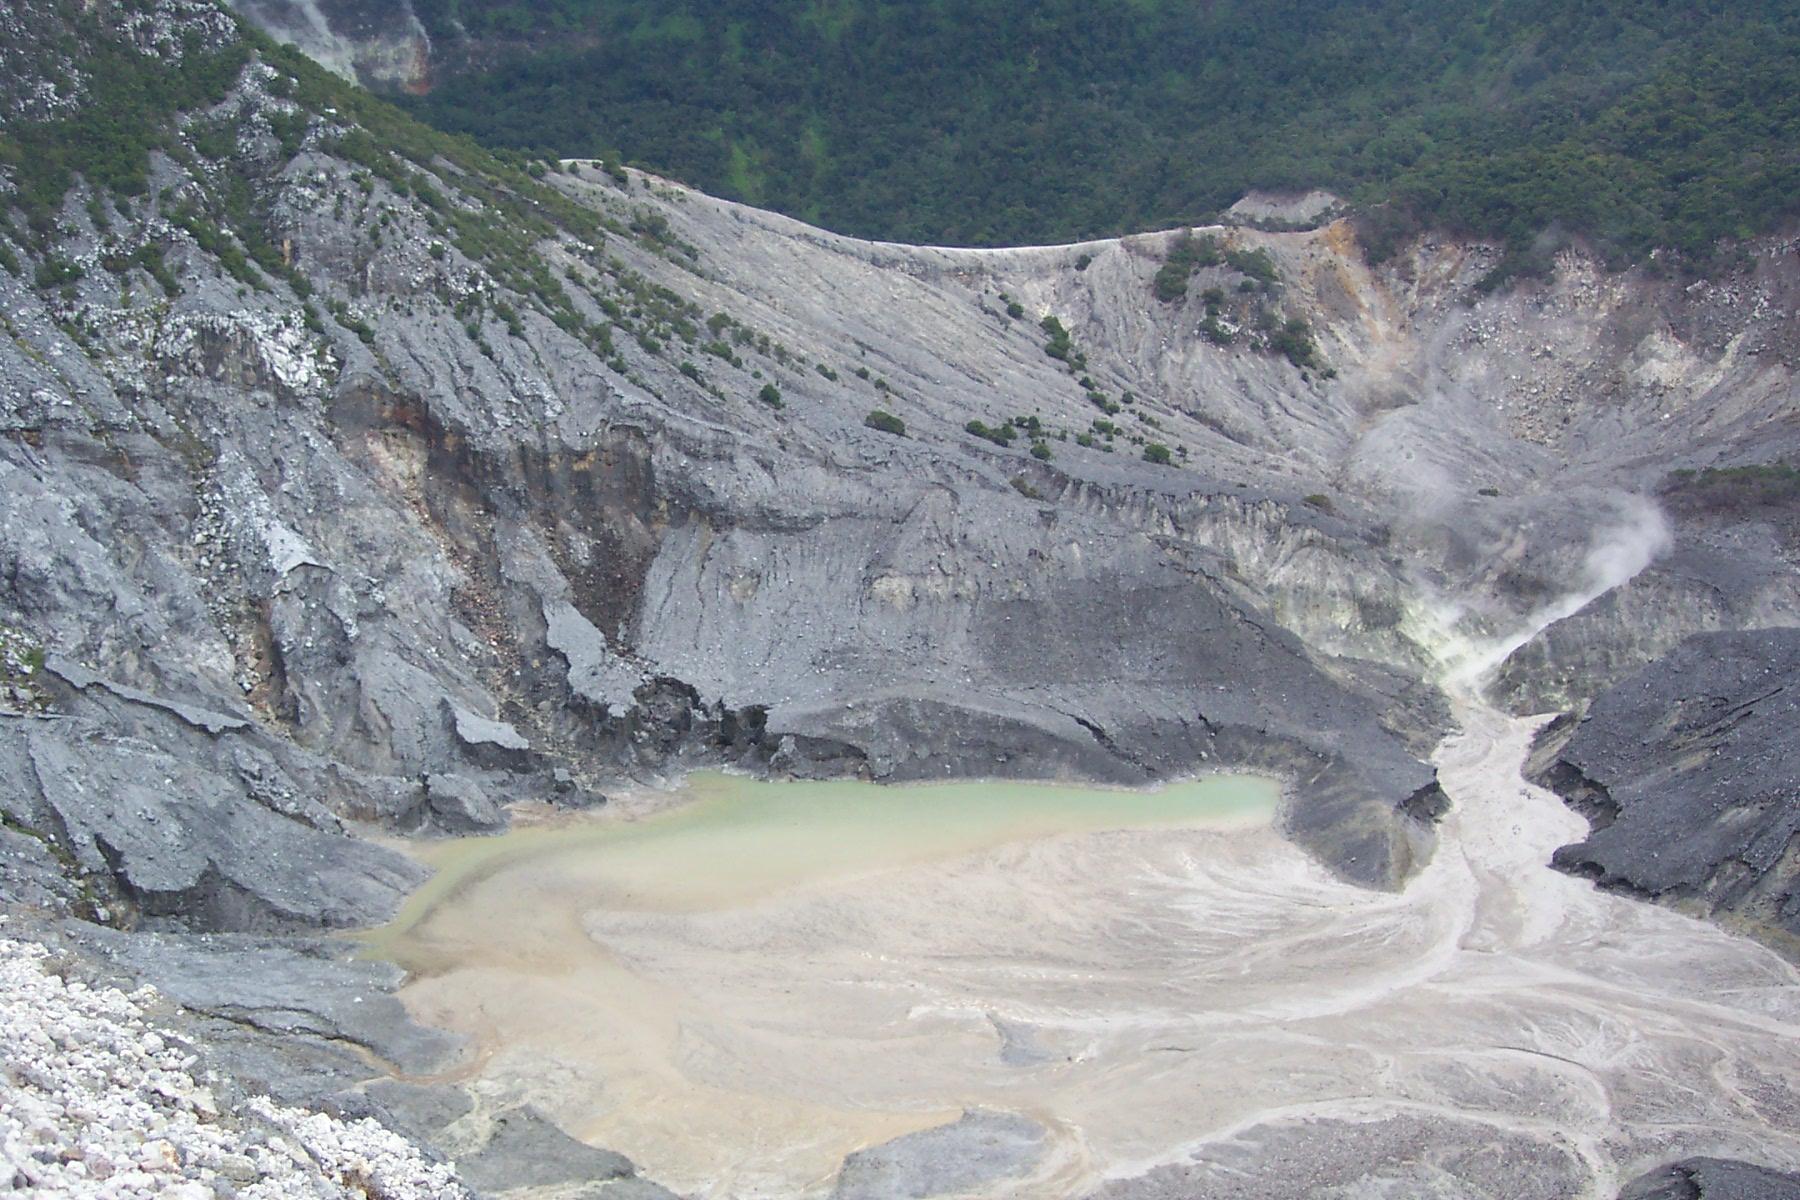 Volcanic Crater, Cliffs, Crater, Landscape, Mount, HQ Photo